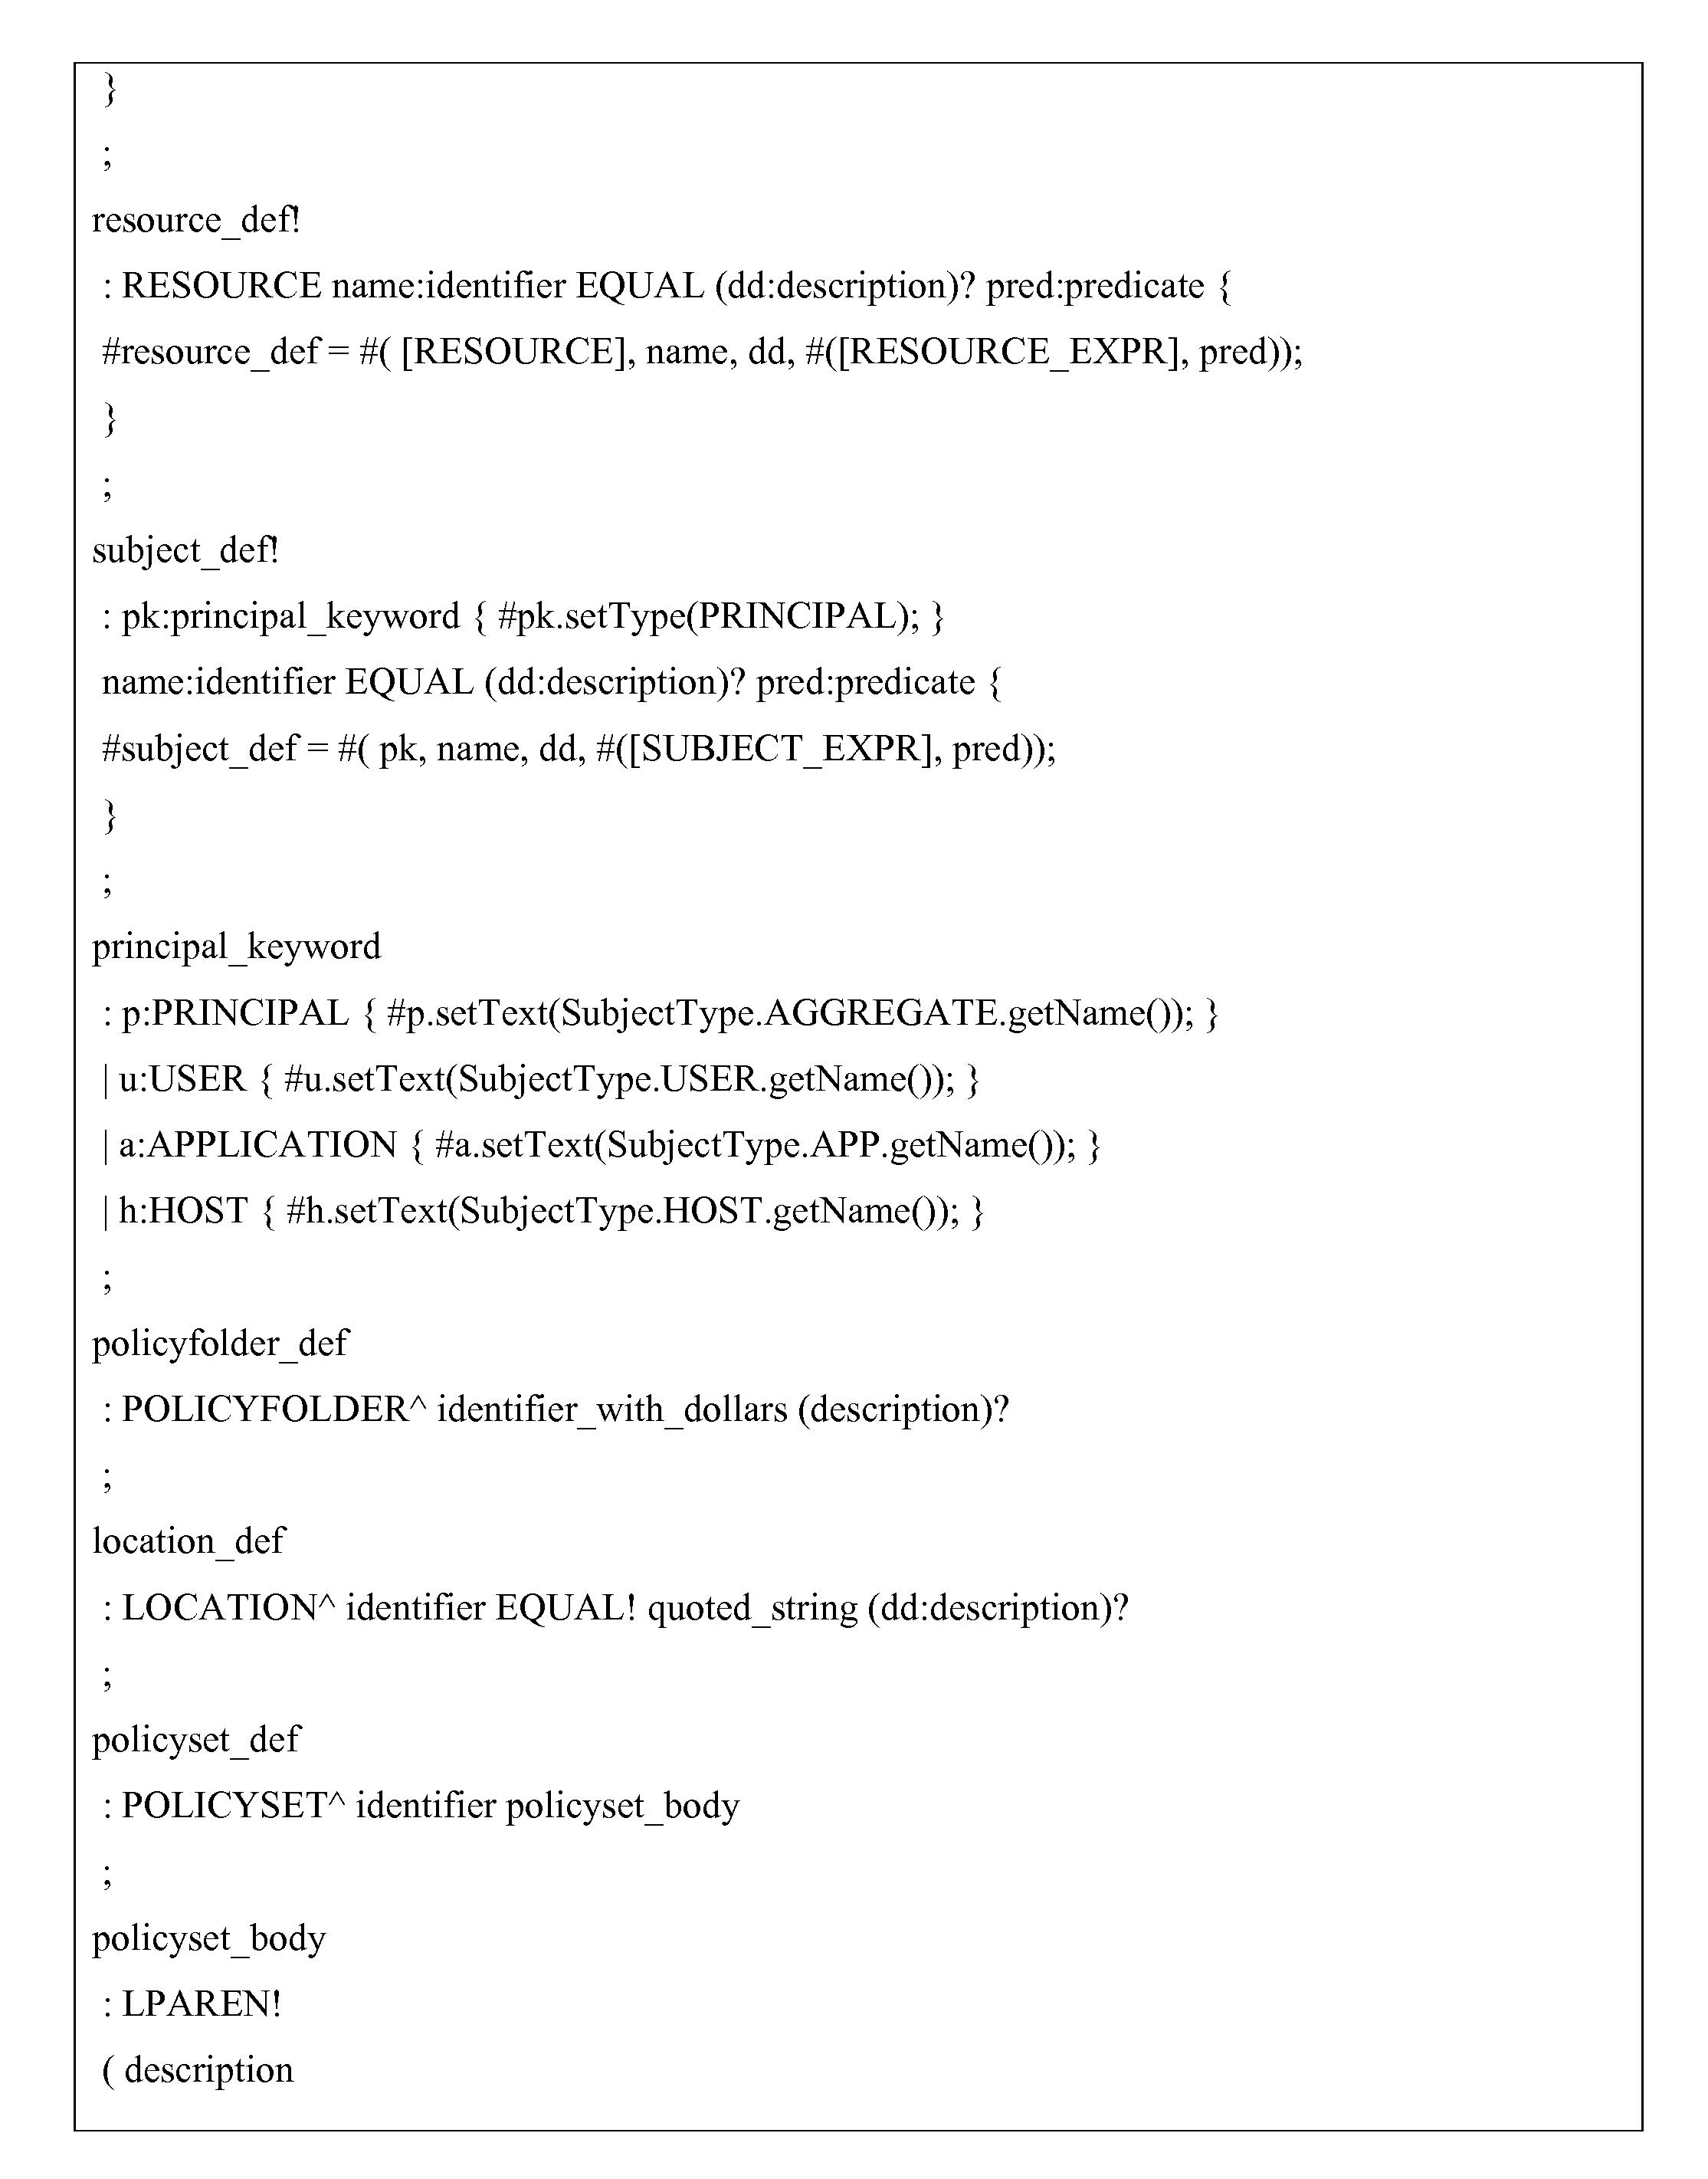 Patent US 7,716,240 B2